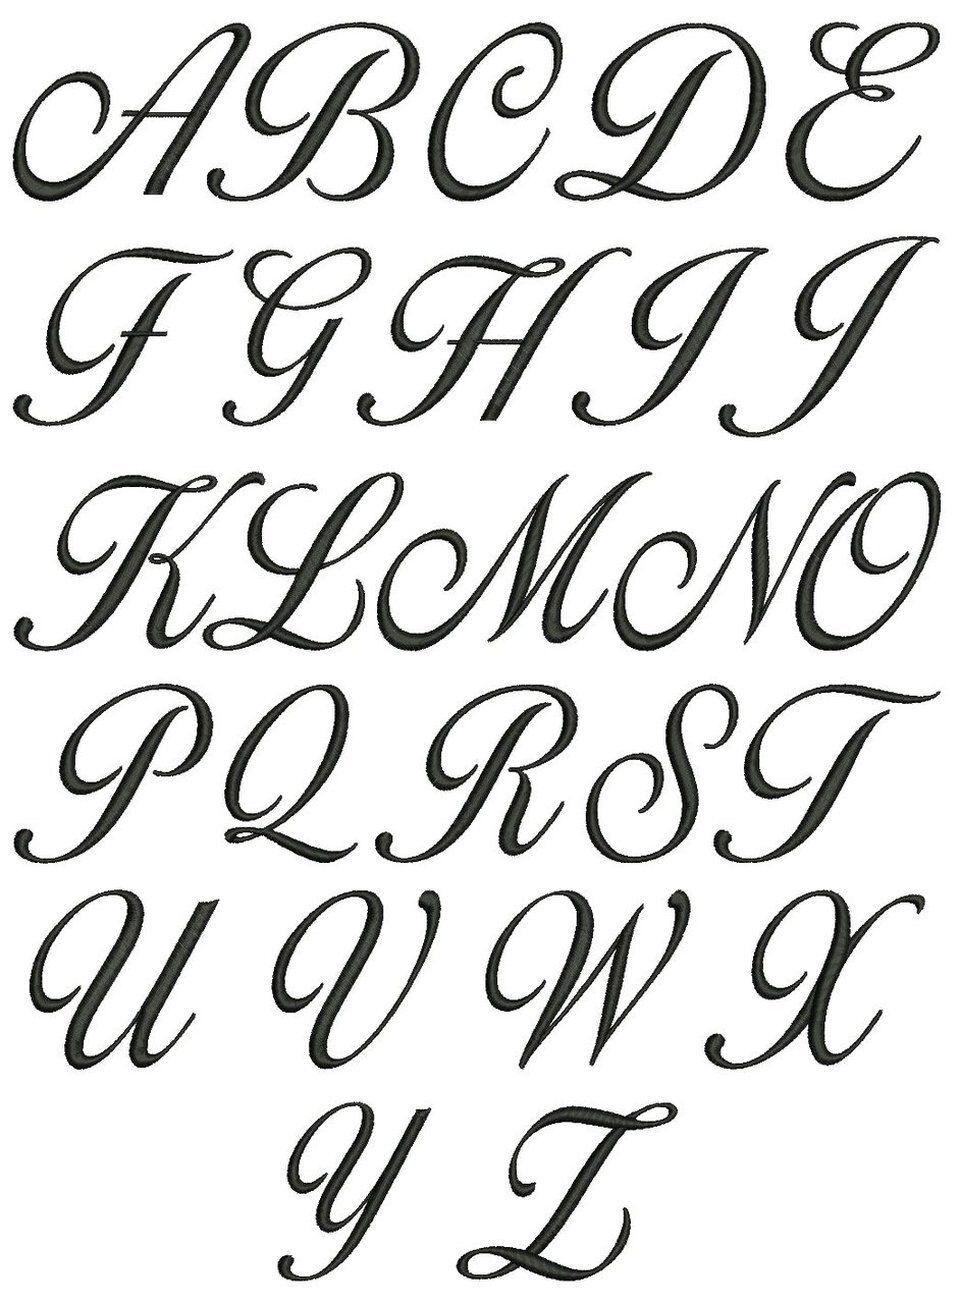 No 120 Lara Script 3 Letter Monogram Designs 1 5 Inch High Cursive Fonts Alphabet Cursive Calligraphy Tattoo Fonts Alphabet How to write your abc in cursive